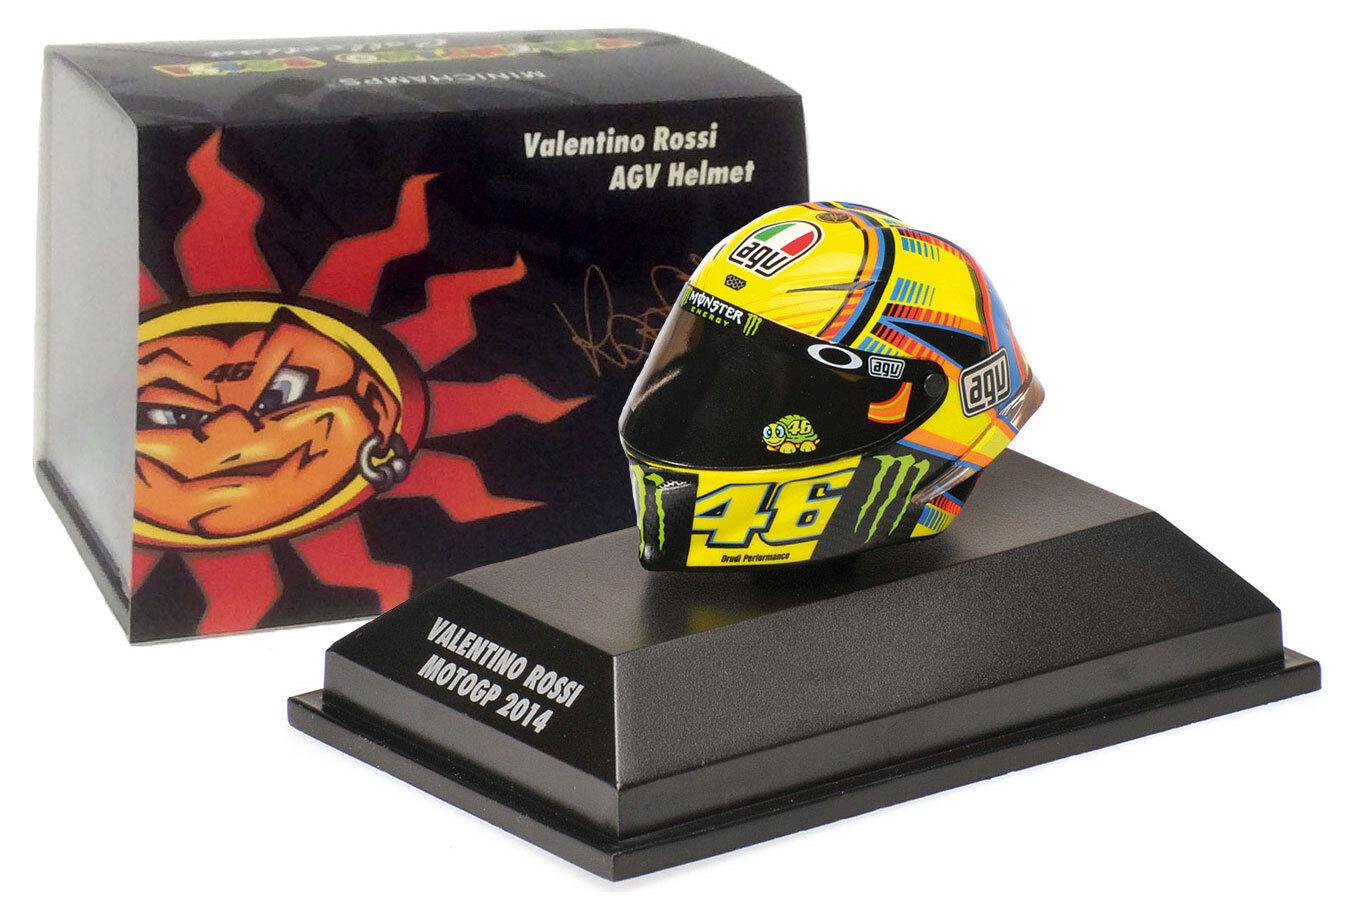 Minichamps valentino rossi agv casque motogp 2014-échelle 1 8